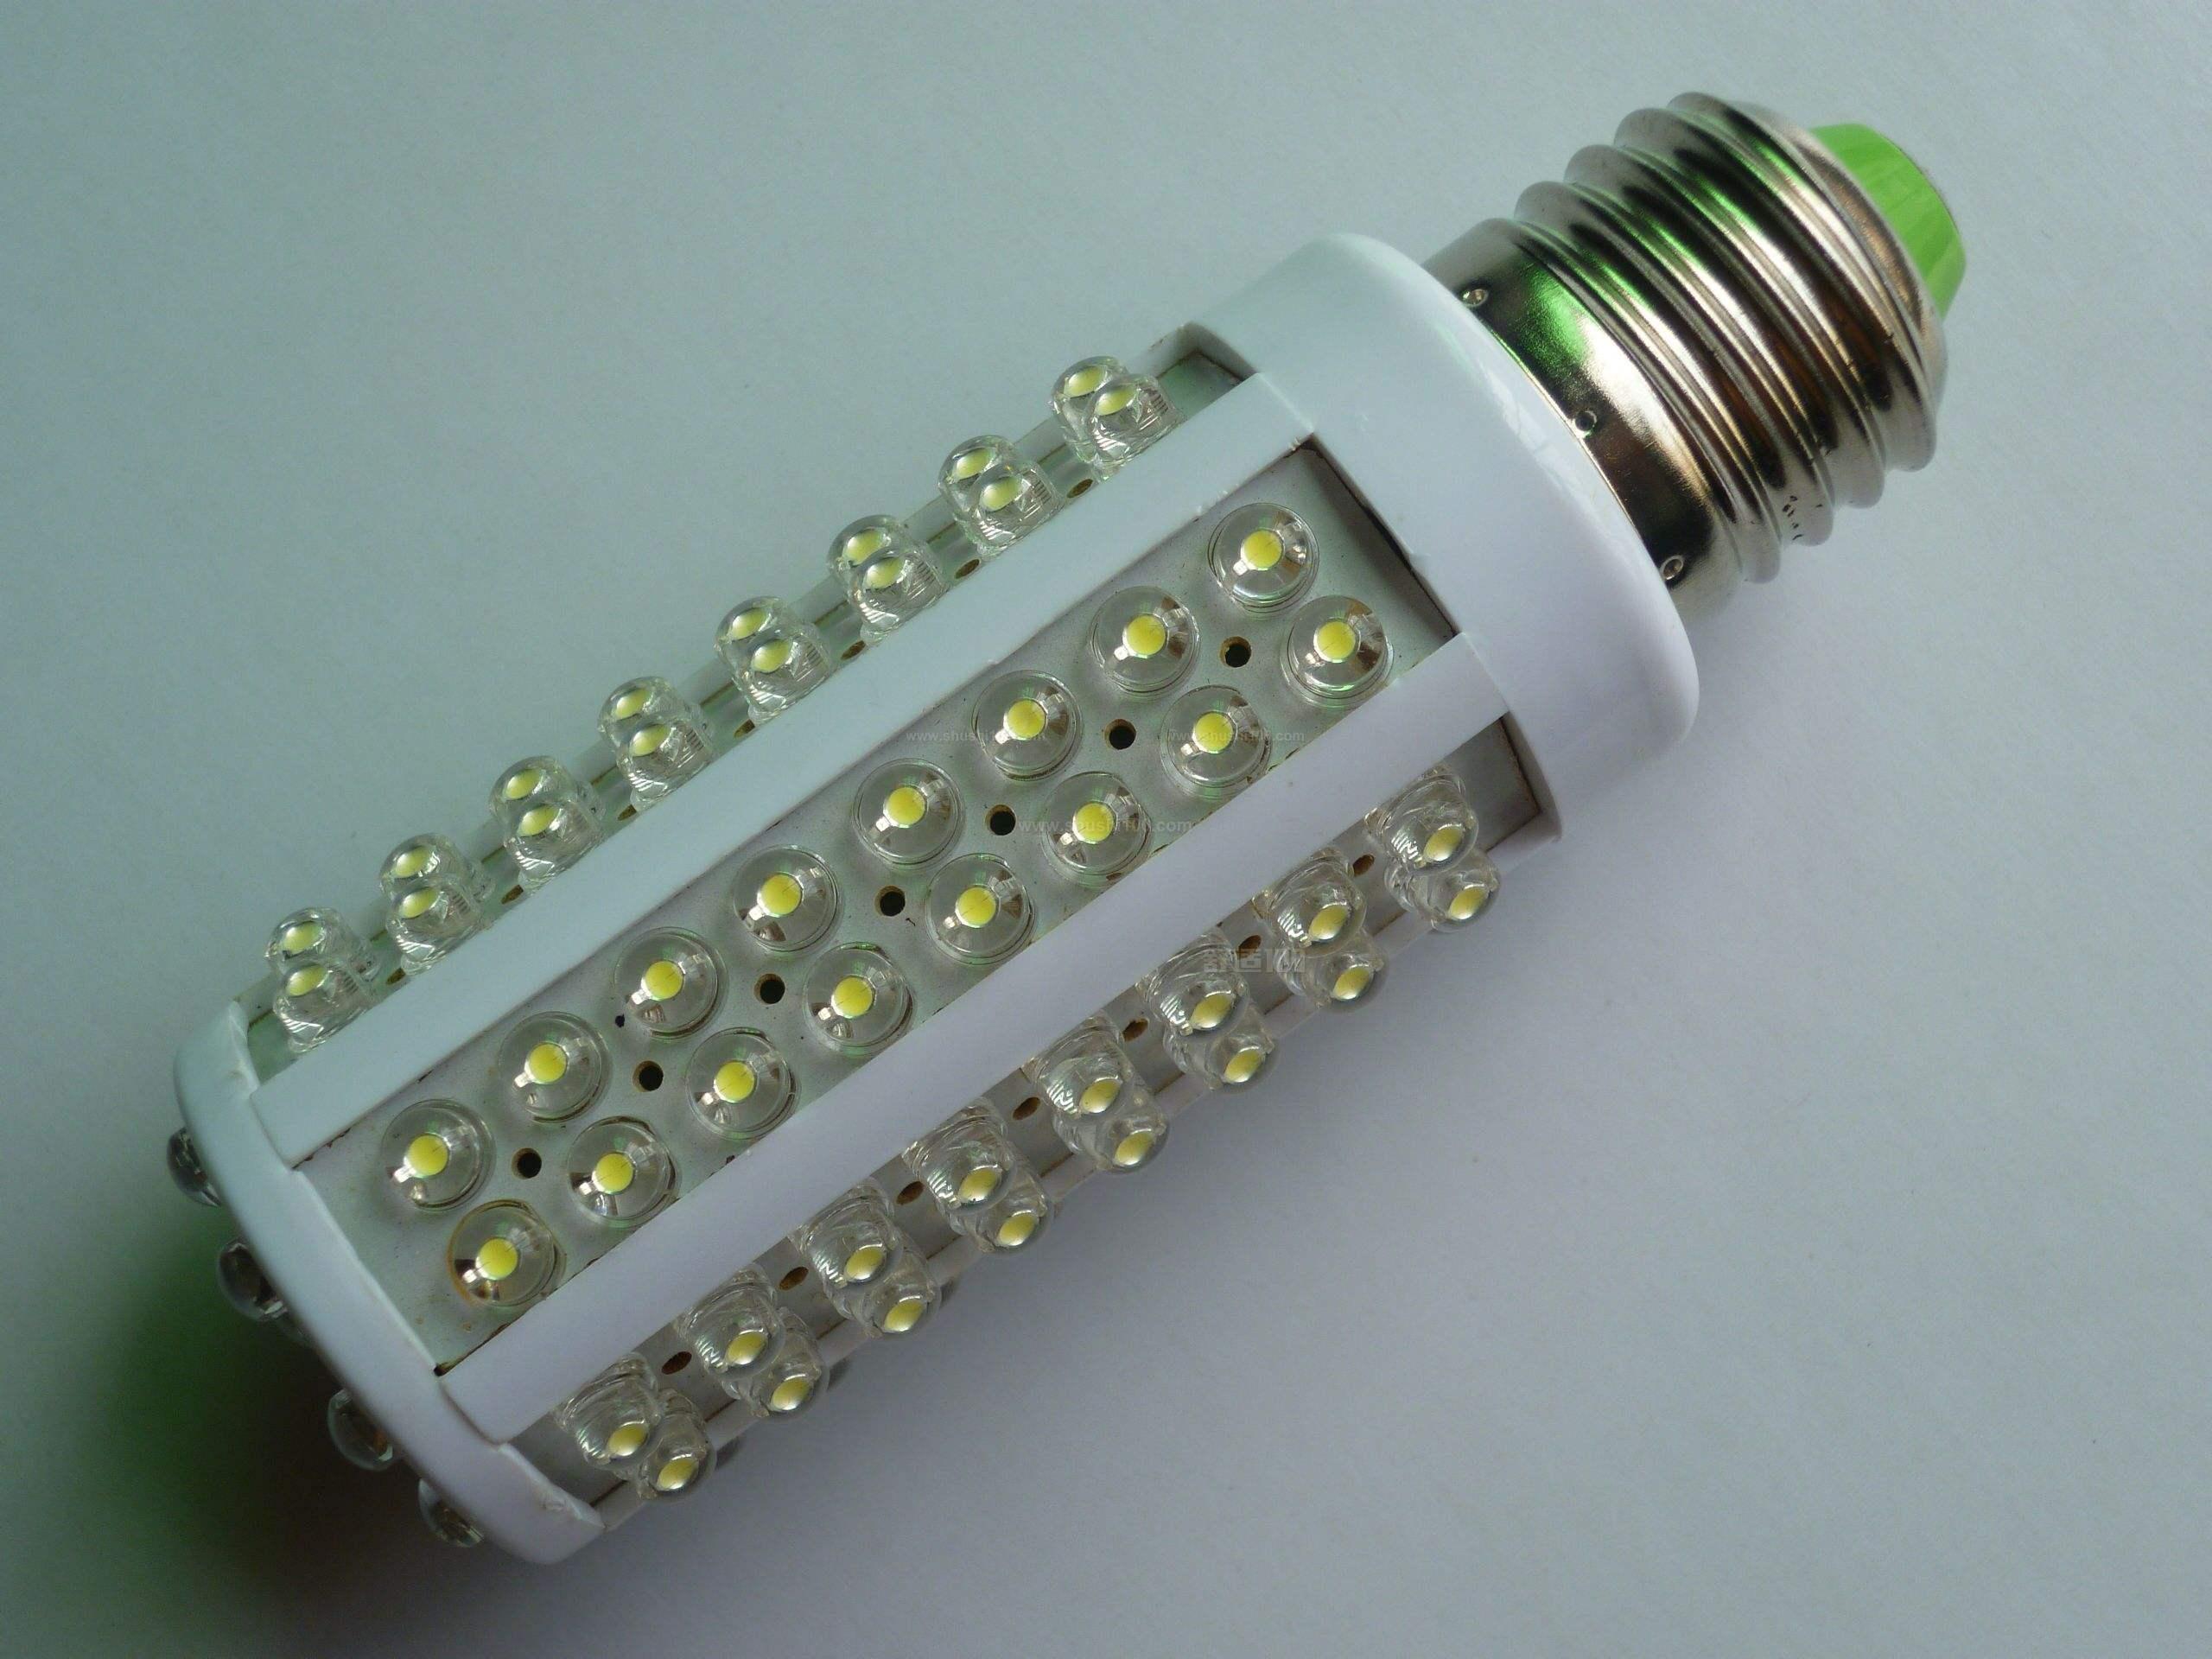 led节能灯多少钱—led节能灯多少钱